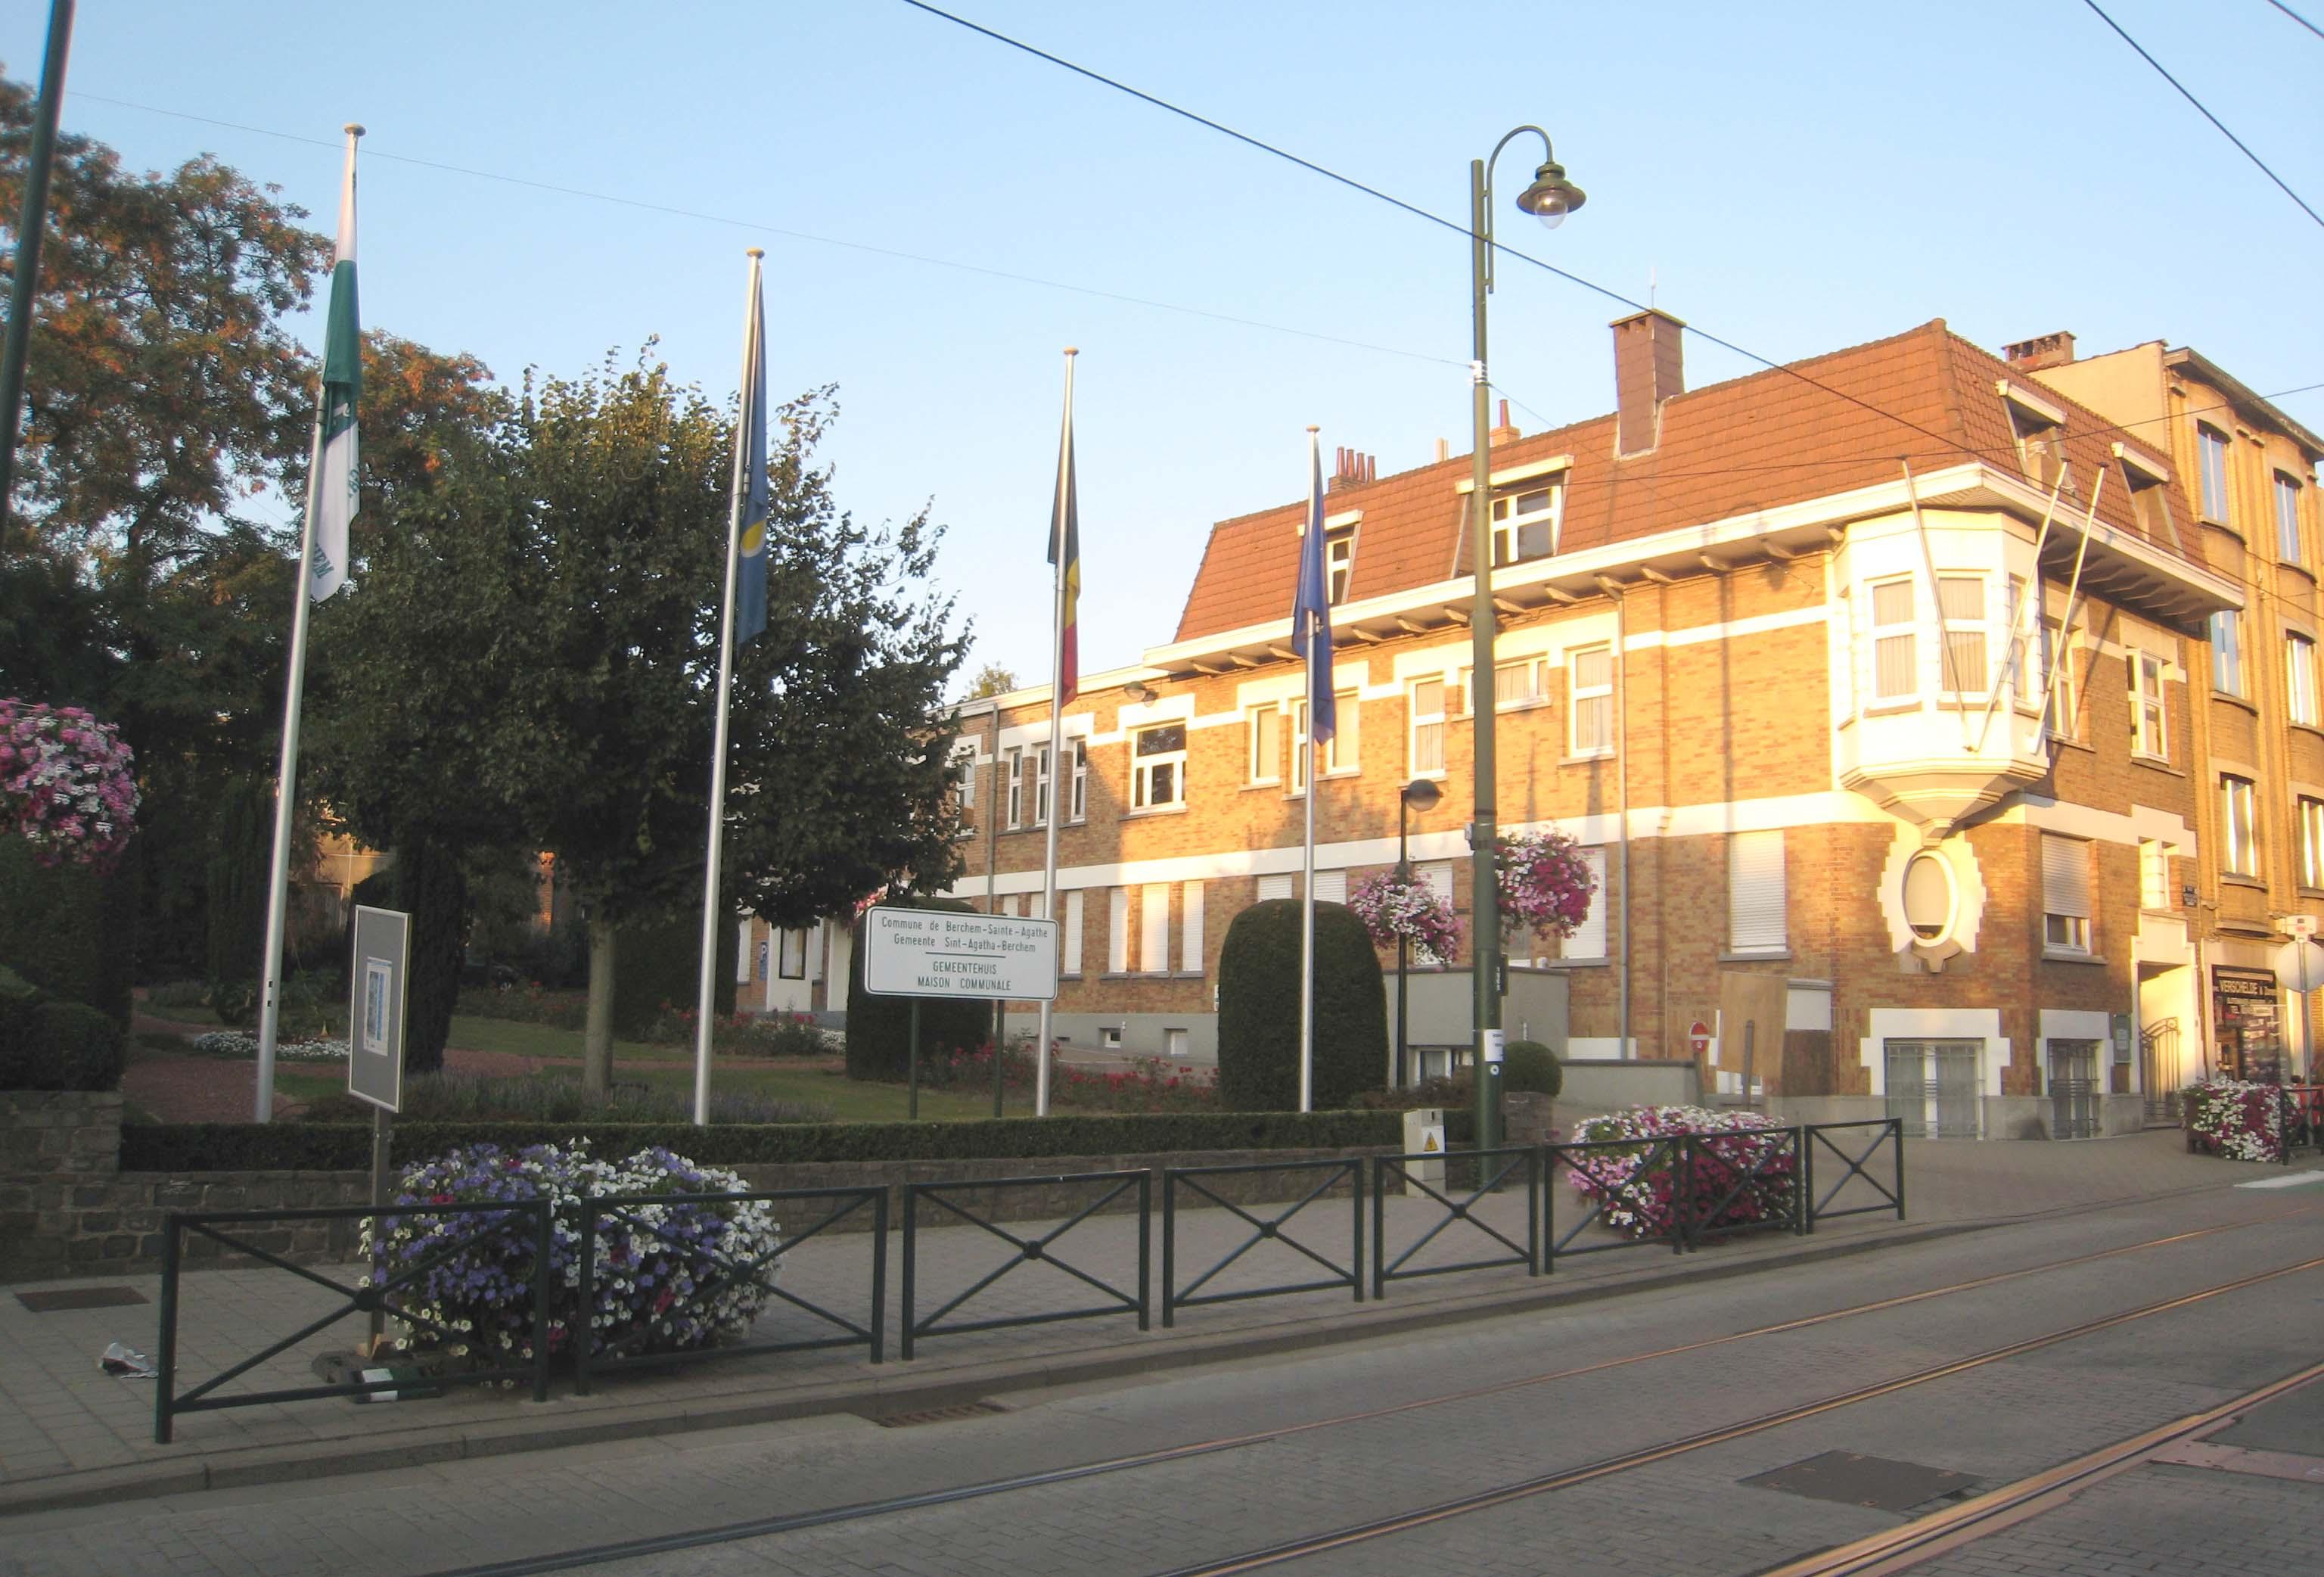 Berchem-Sainte-Agathe